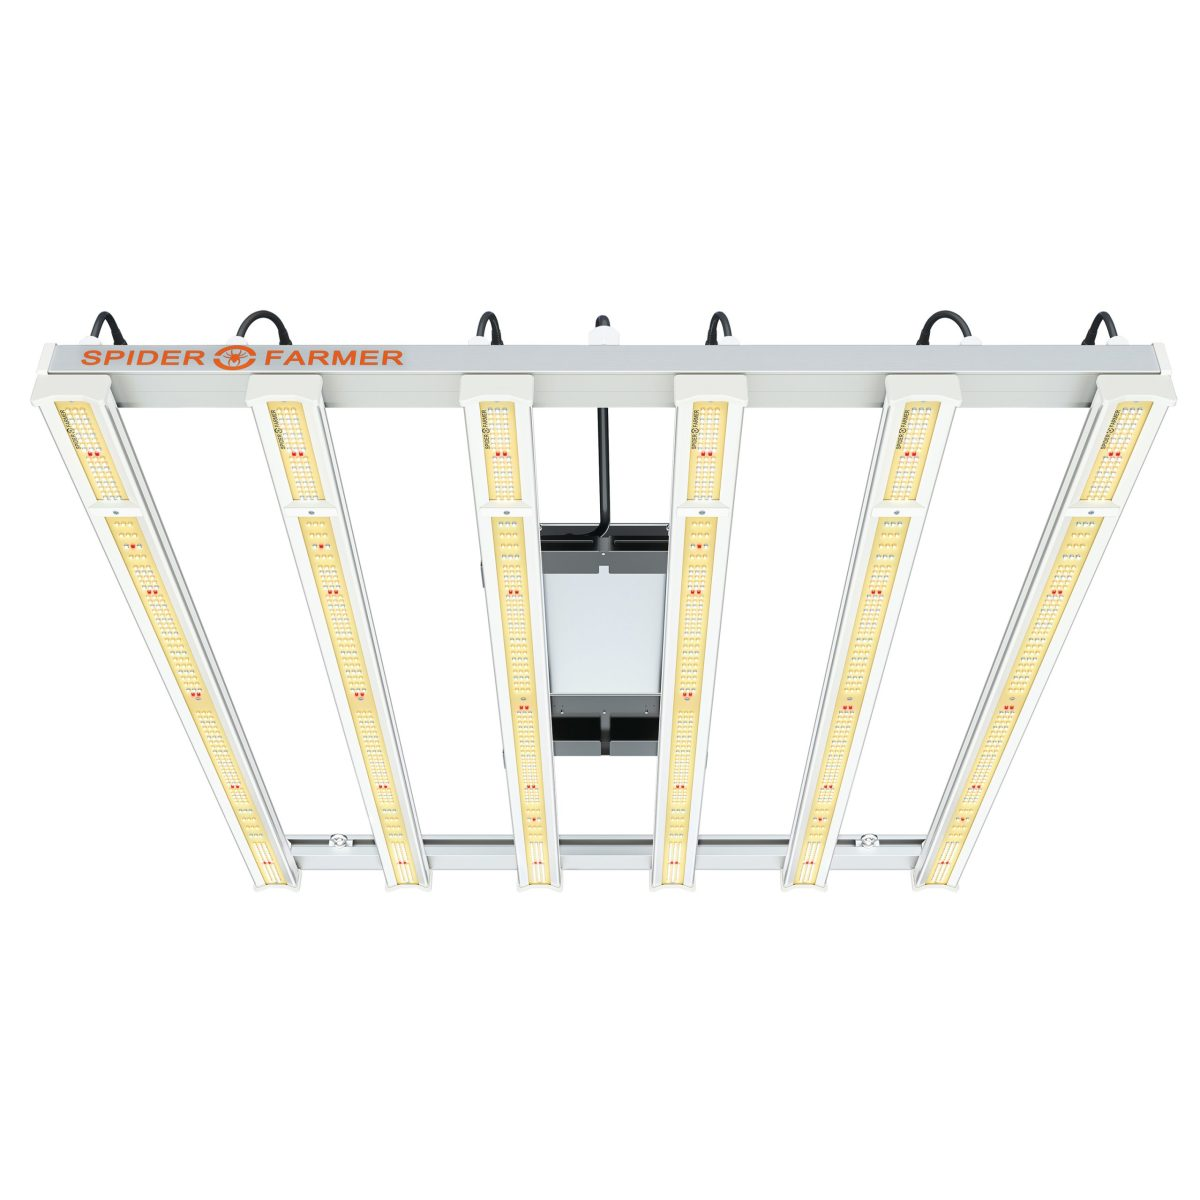 SE5000 led grow light